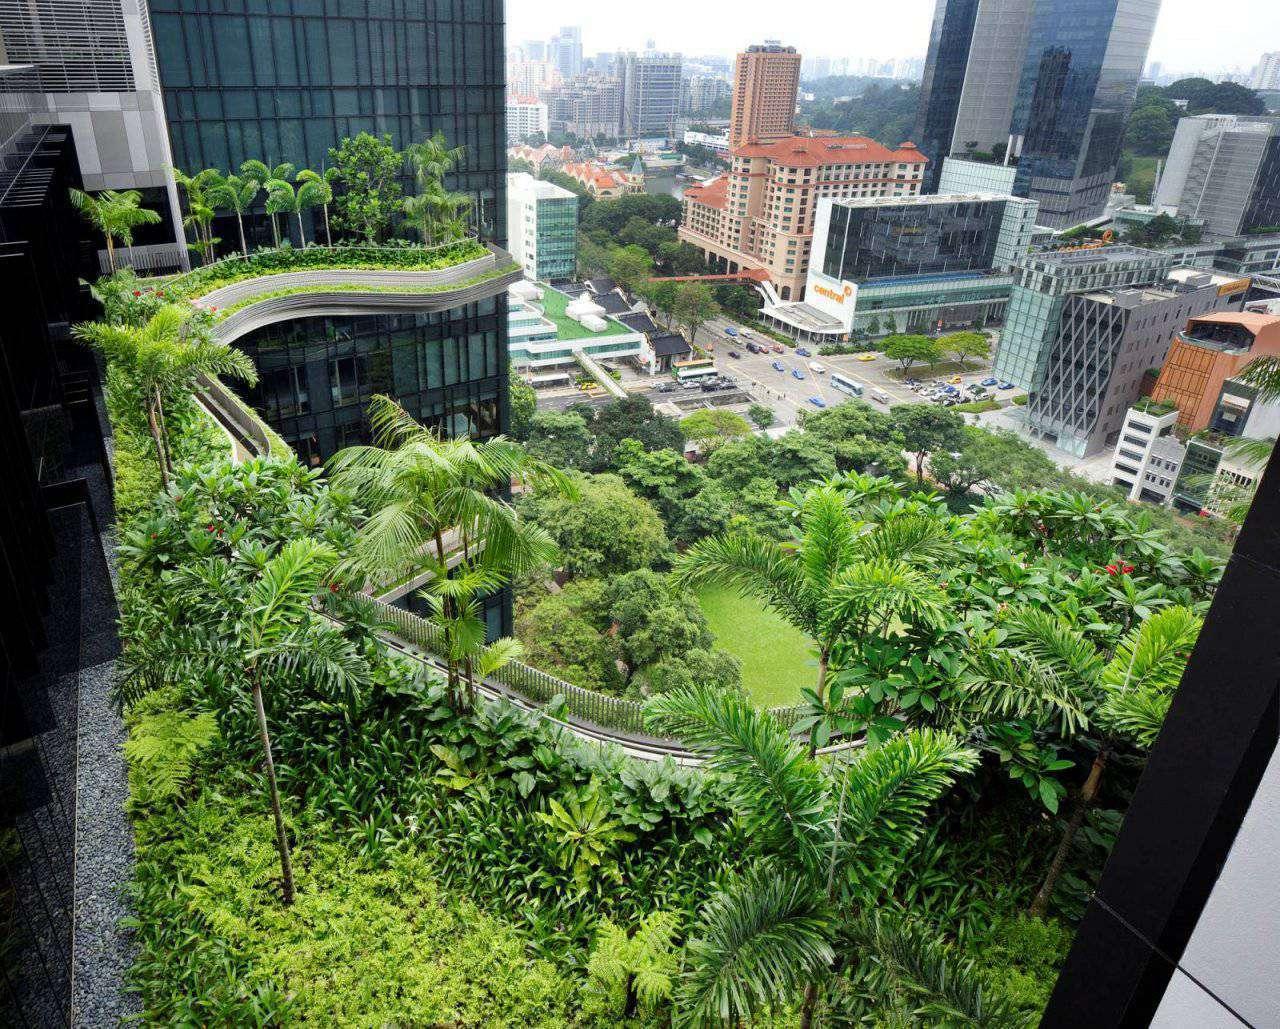 Ogród w centrum miasta 3